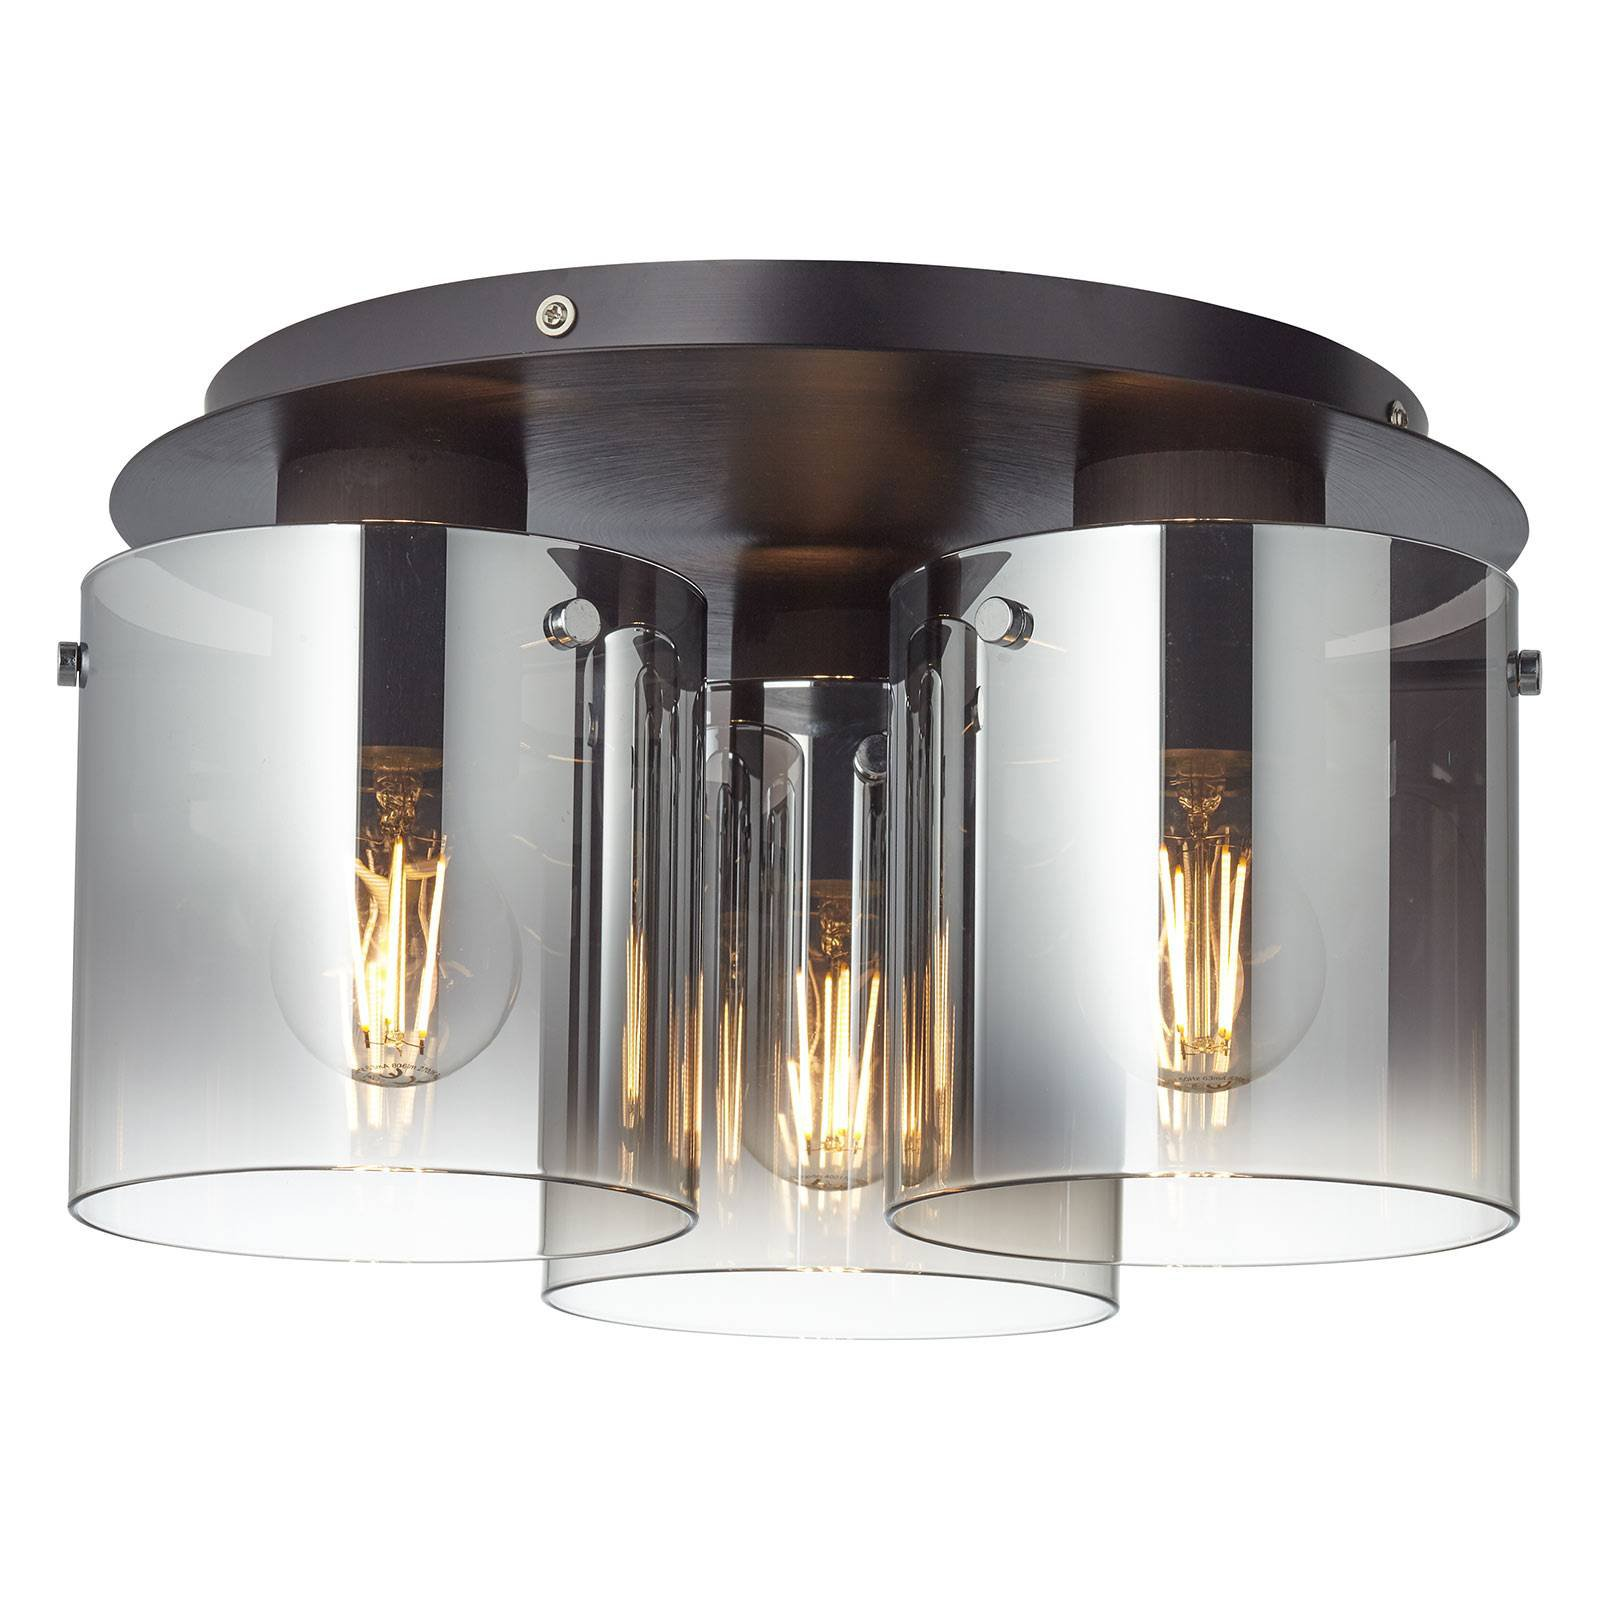 Taklampe Beth med røykglass, 3 lyskilder